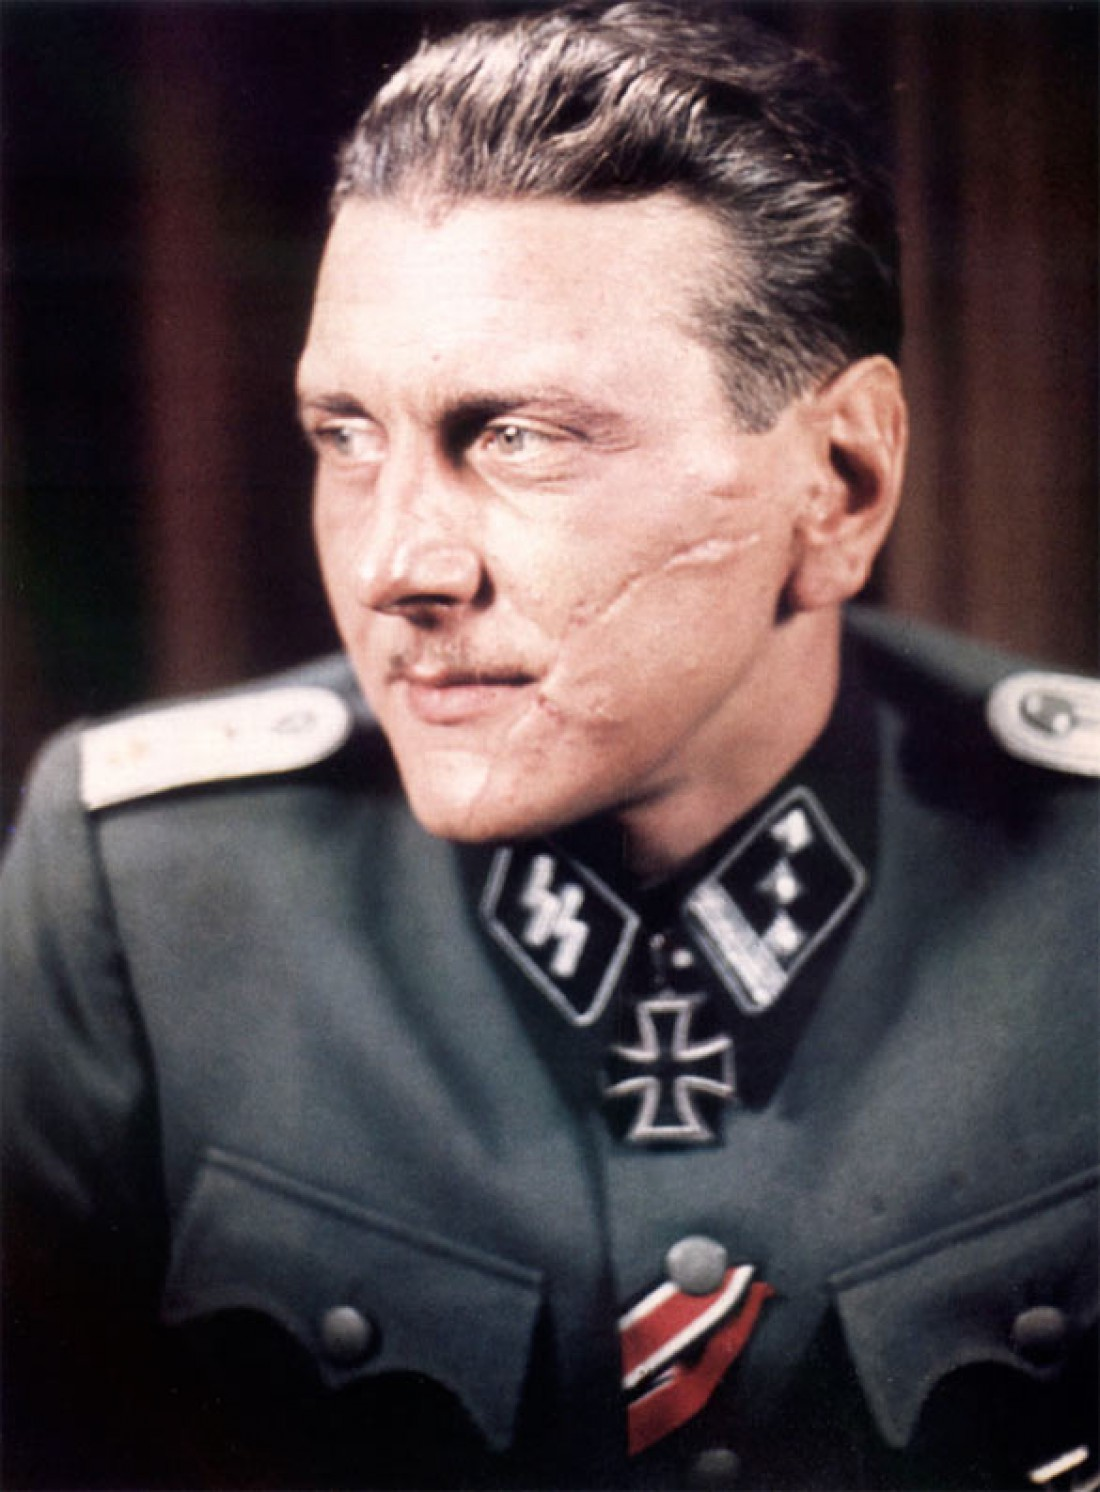 Немецкий диверсант Отто Скорцени